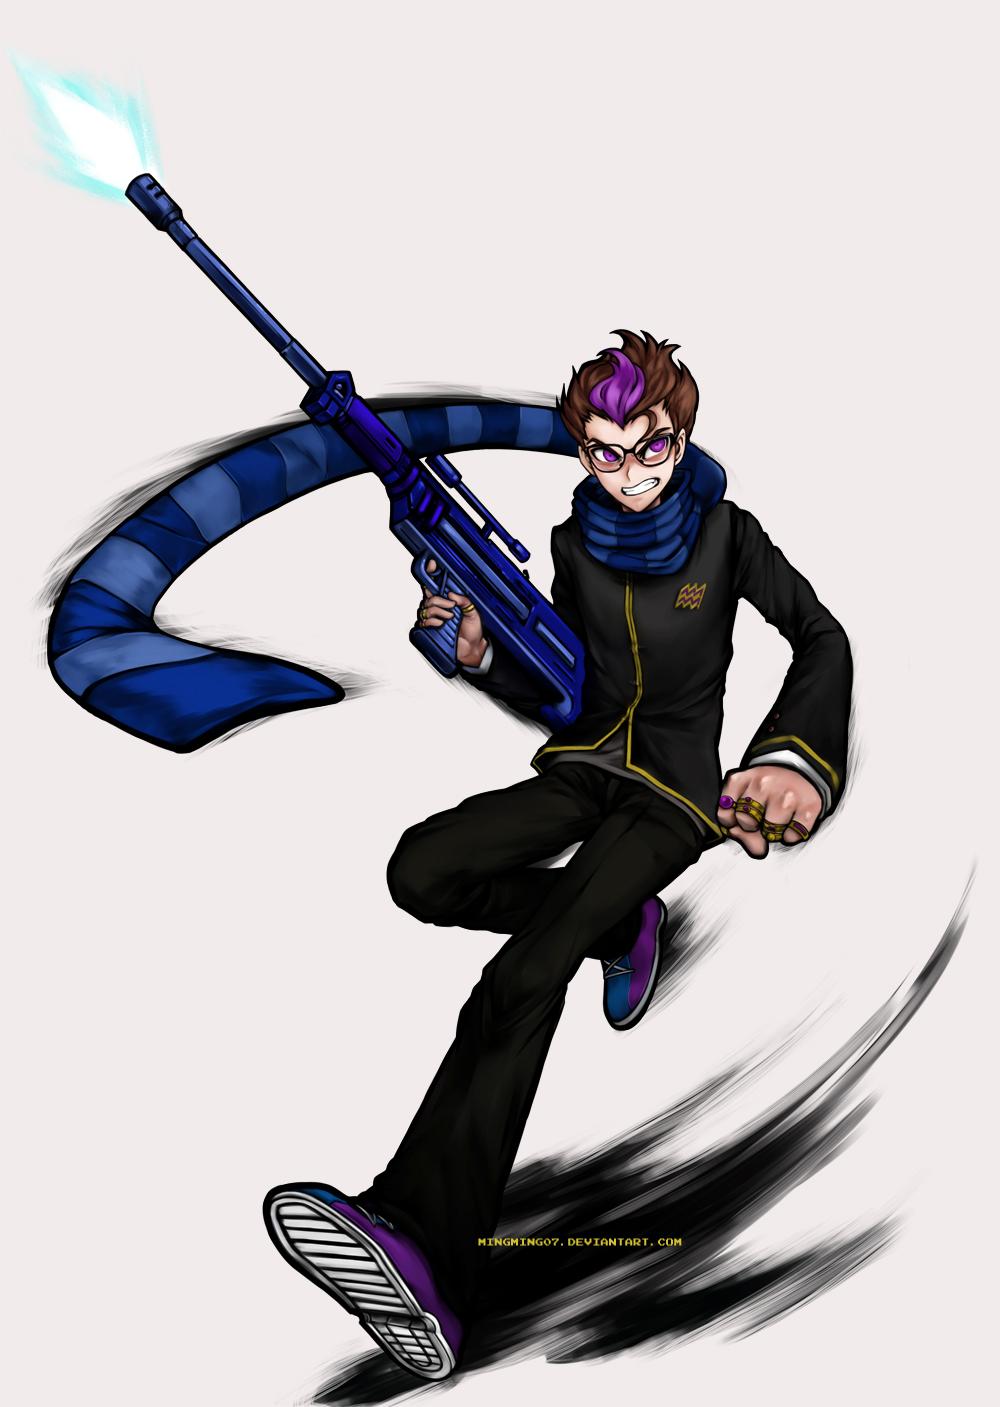 Danganstuck- Super High School Level Marksman by mingming07